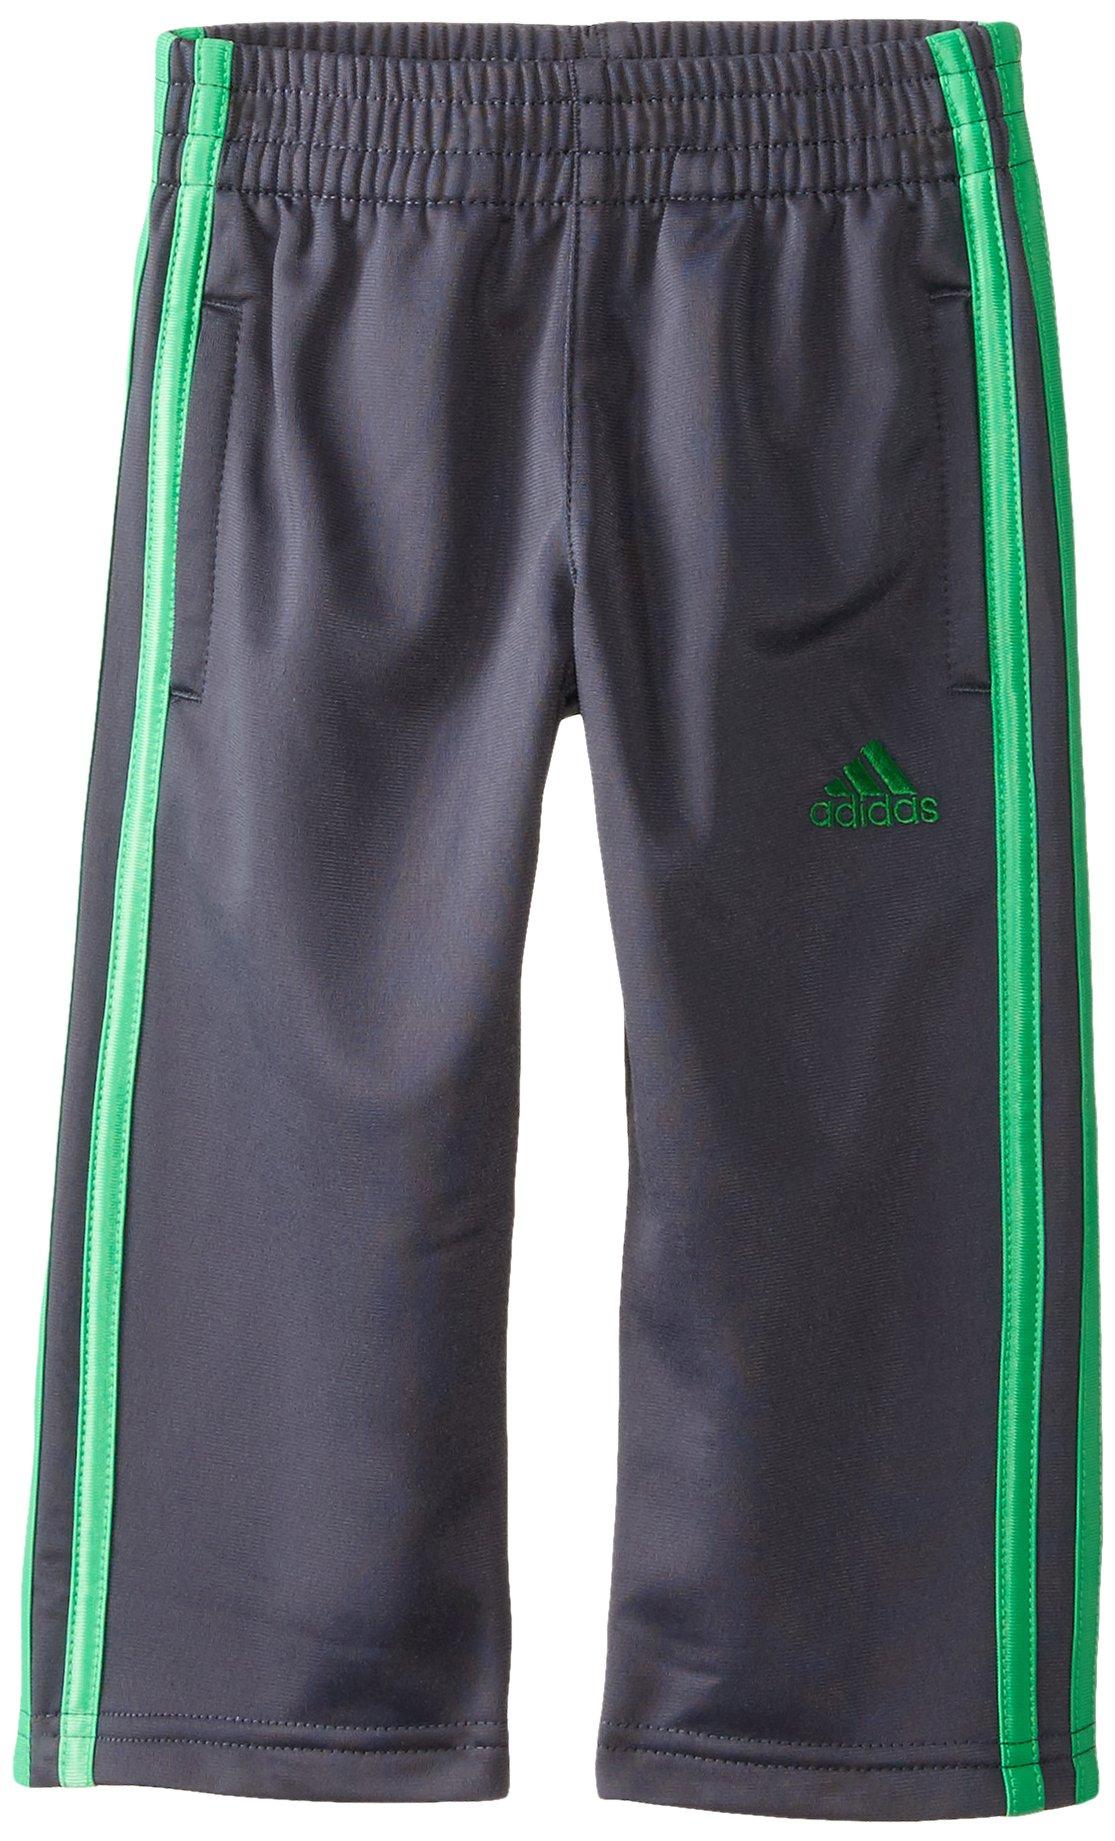 adidas Toddler Boys' Tricot Pant, Mercury Grey/Green, 2T